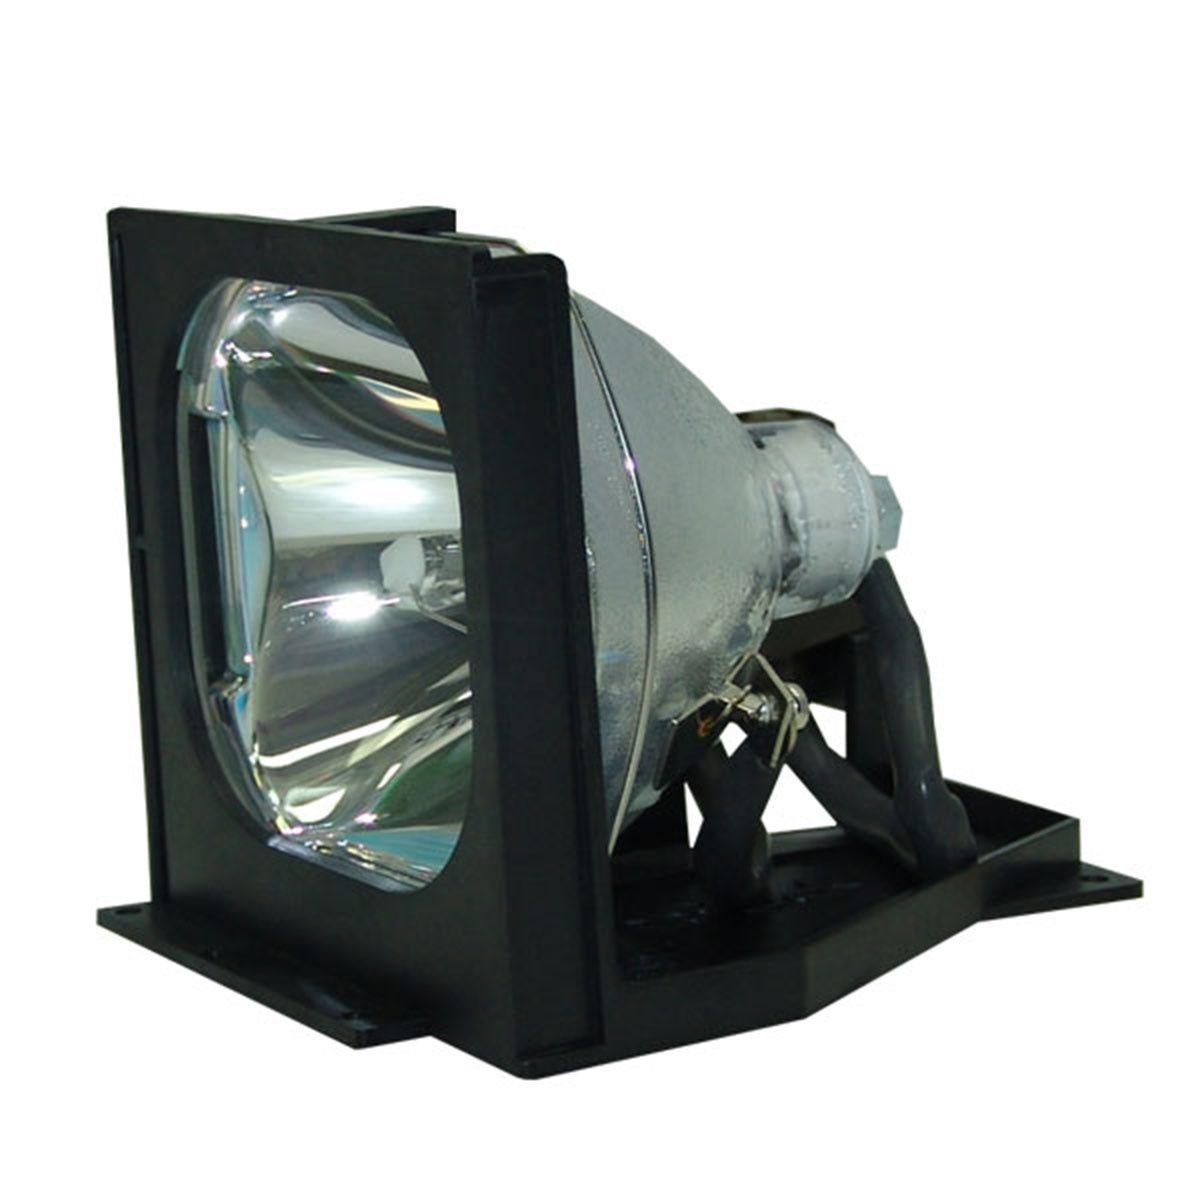 POA-LMP27 POALMP27 LMP27 610-287-5379 for SANYO PLC-SU07 PLC-SU07B PLC-SU07N PLC-SU10 Projector Bulb Lamp WITH HOUSING projector lamp poa lmp128 compatible bulb with housing for sanyo plc xf71 plc xf1000 lx1000 6 years store